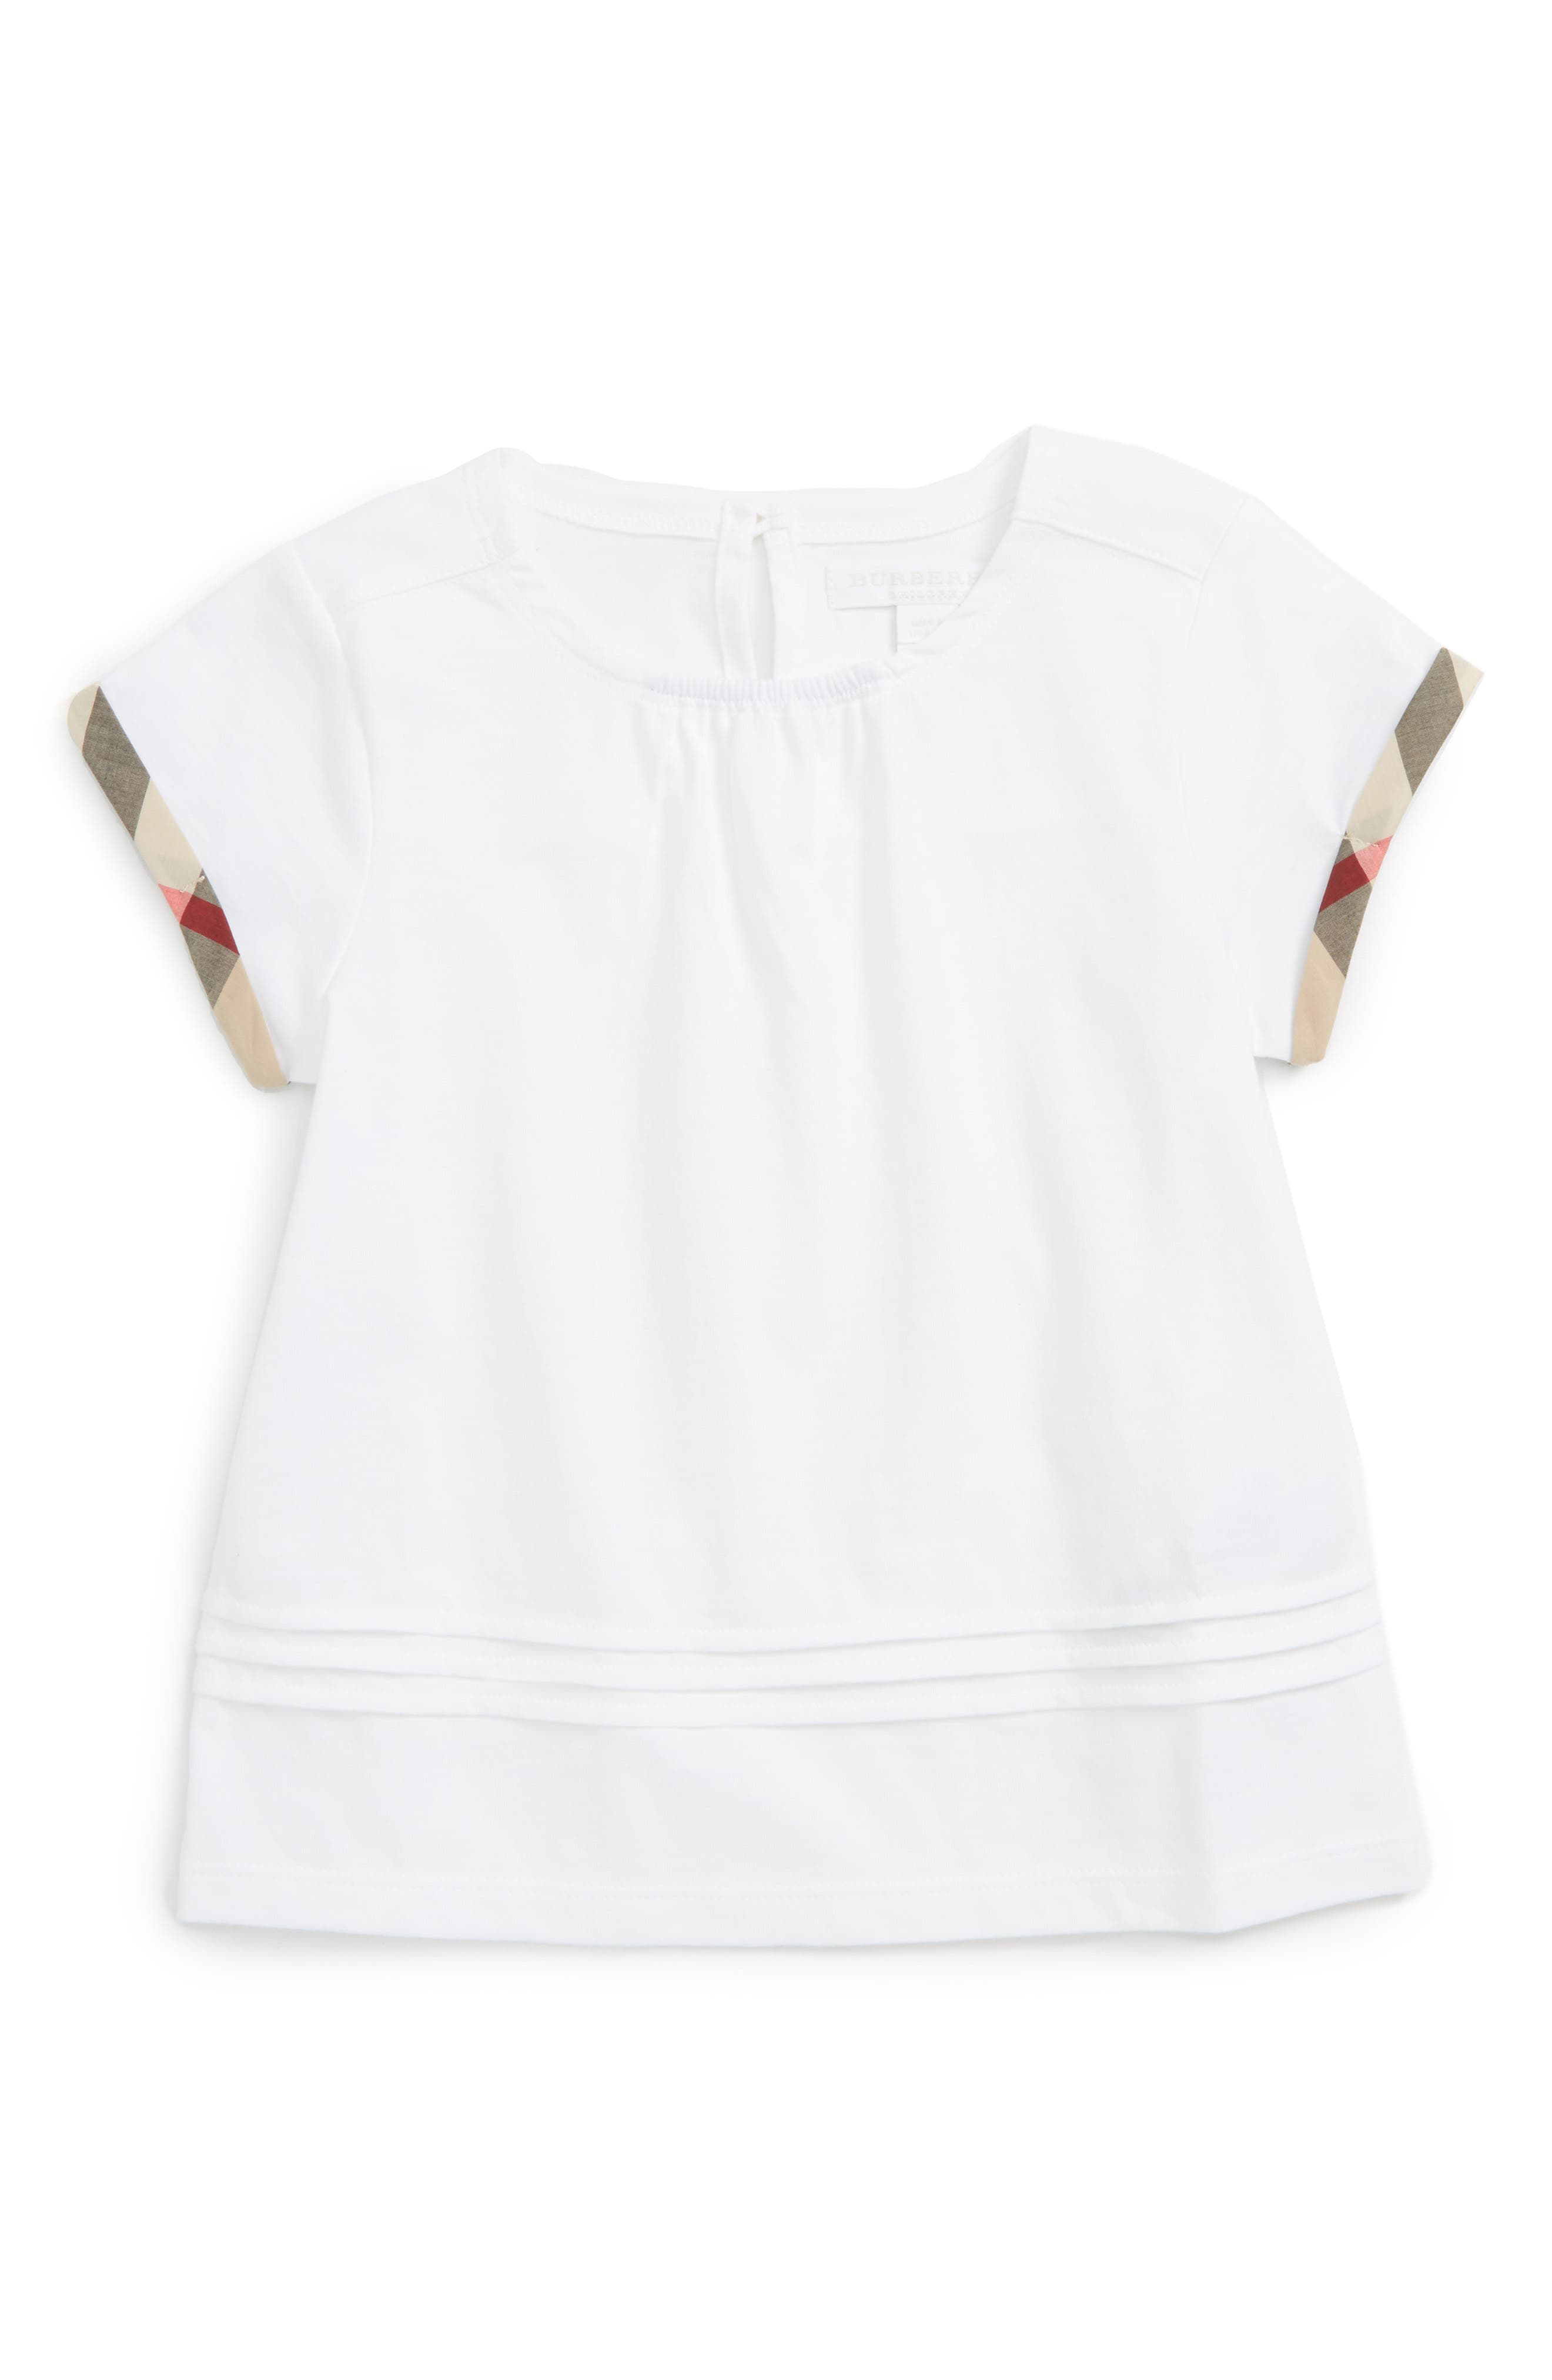 Gisselle Shirt,                         Main,                         color, 100